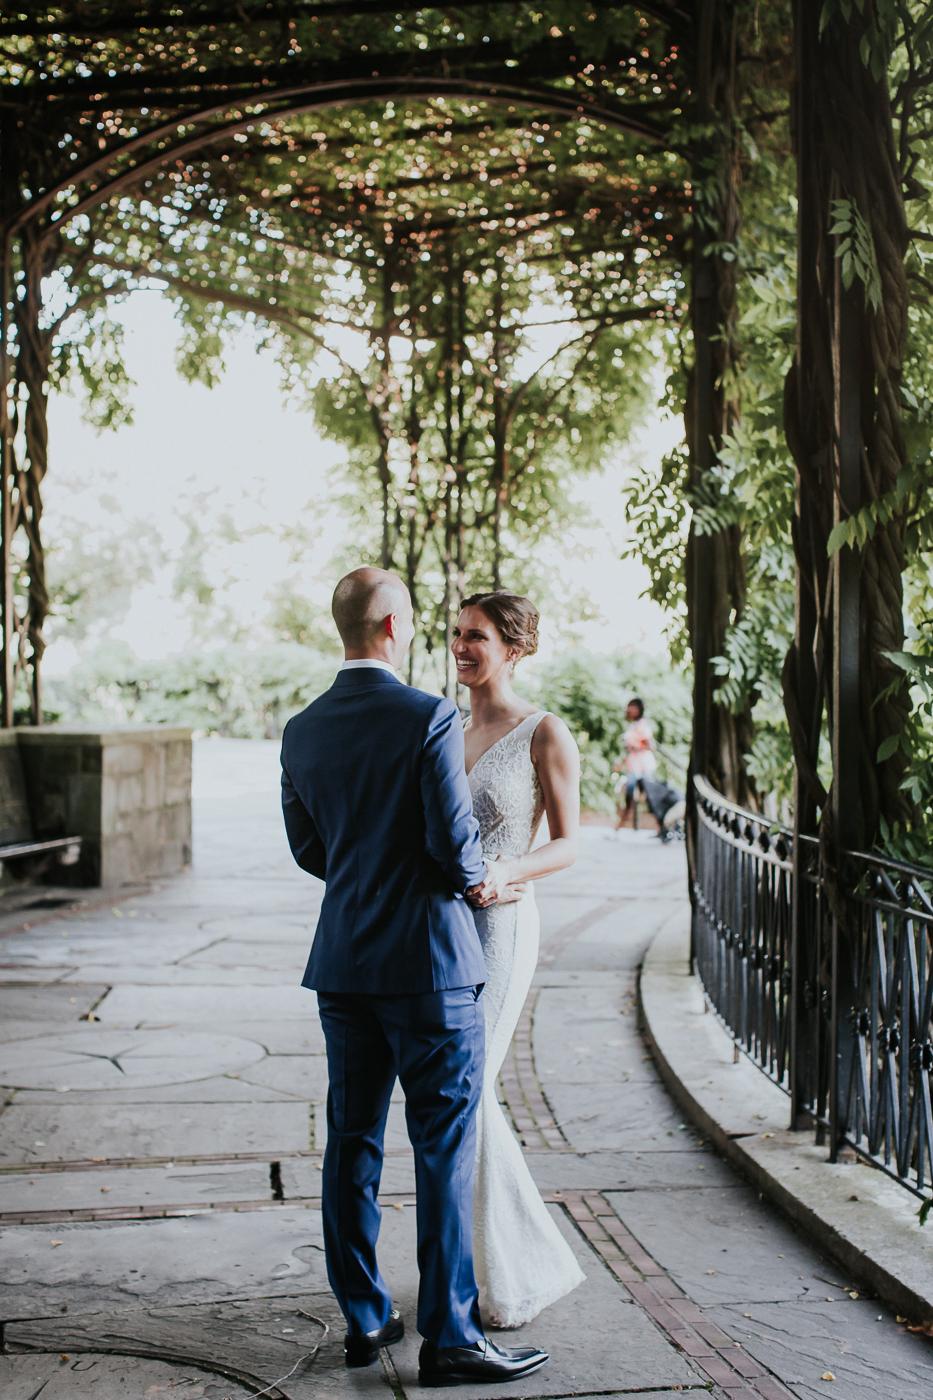 NYC-Central-Park-Conservatory-Garden-Intimate-Elopement-Documentary-Wedding-Photographer-29.jpg